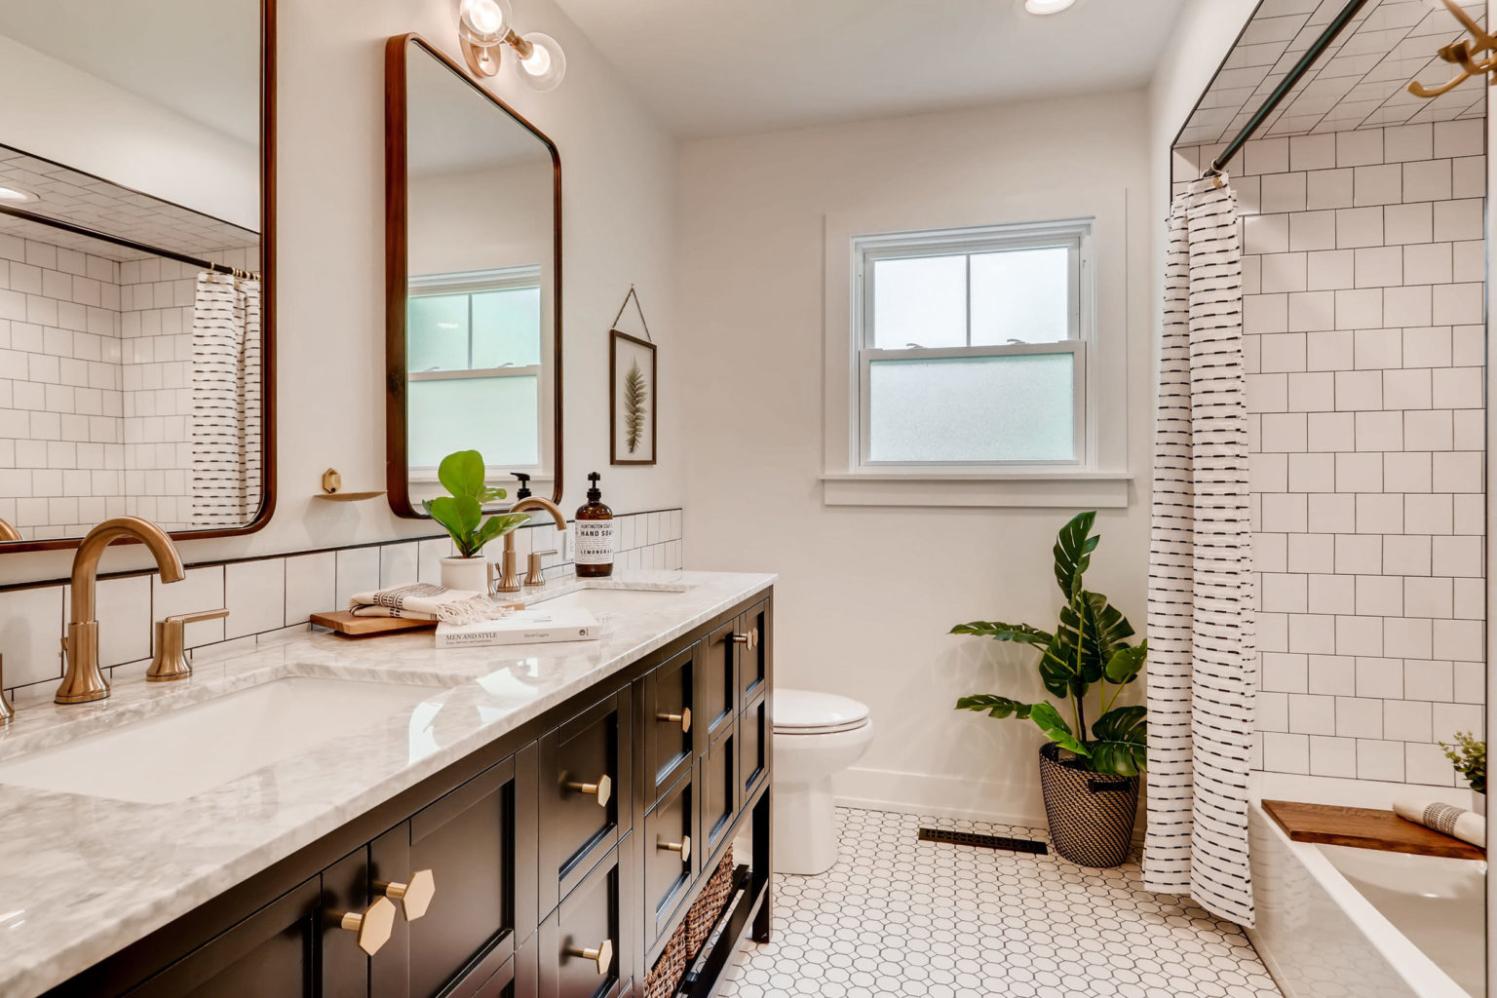 621+67th+st+downers+grove+il Print 021 6 2nd+floor+bathroom 3600x2400 300dpi